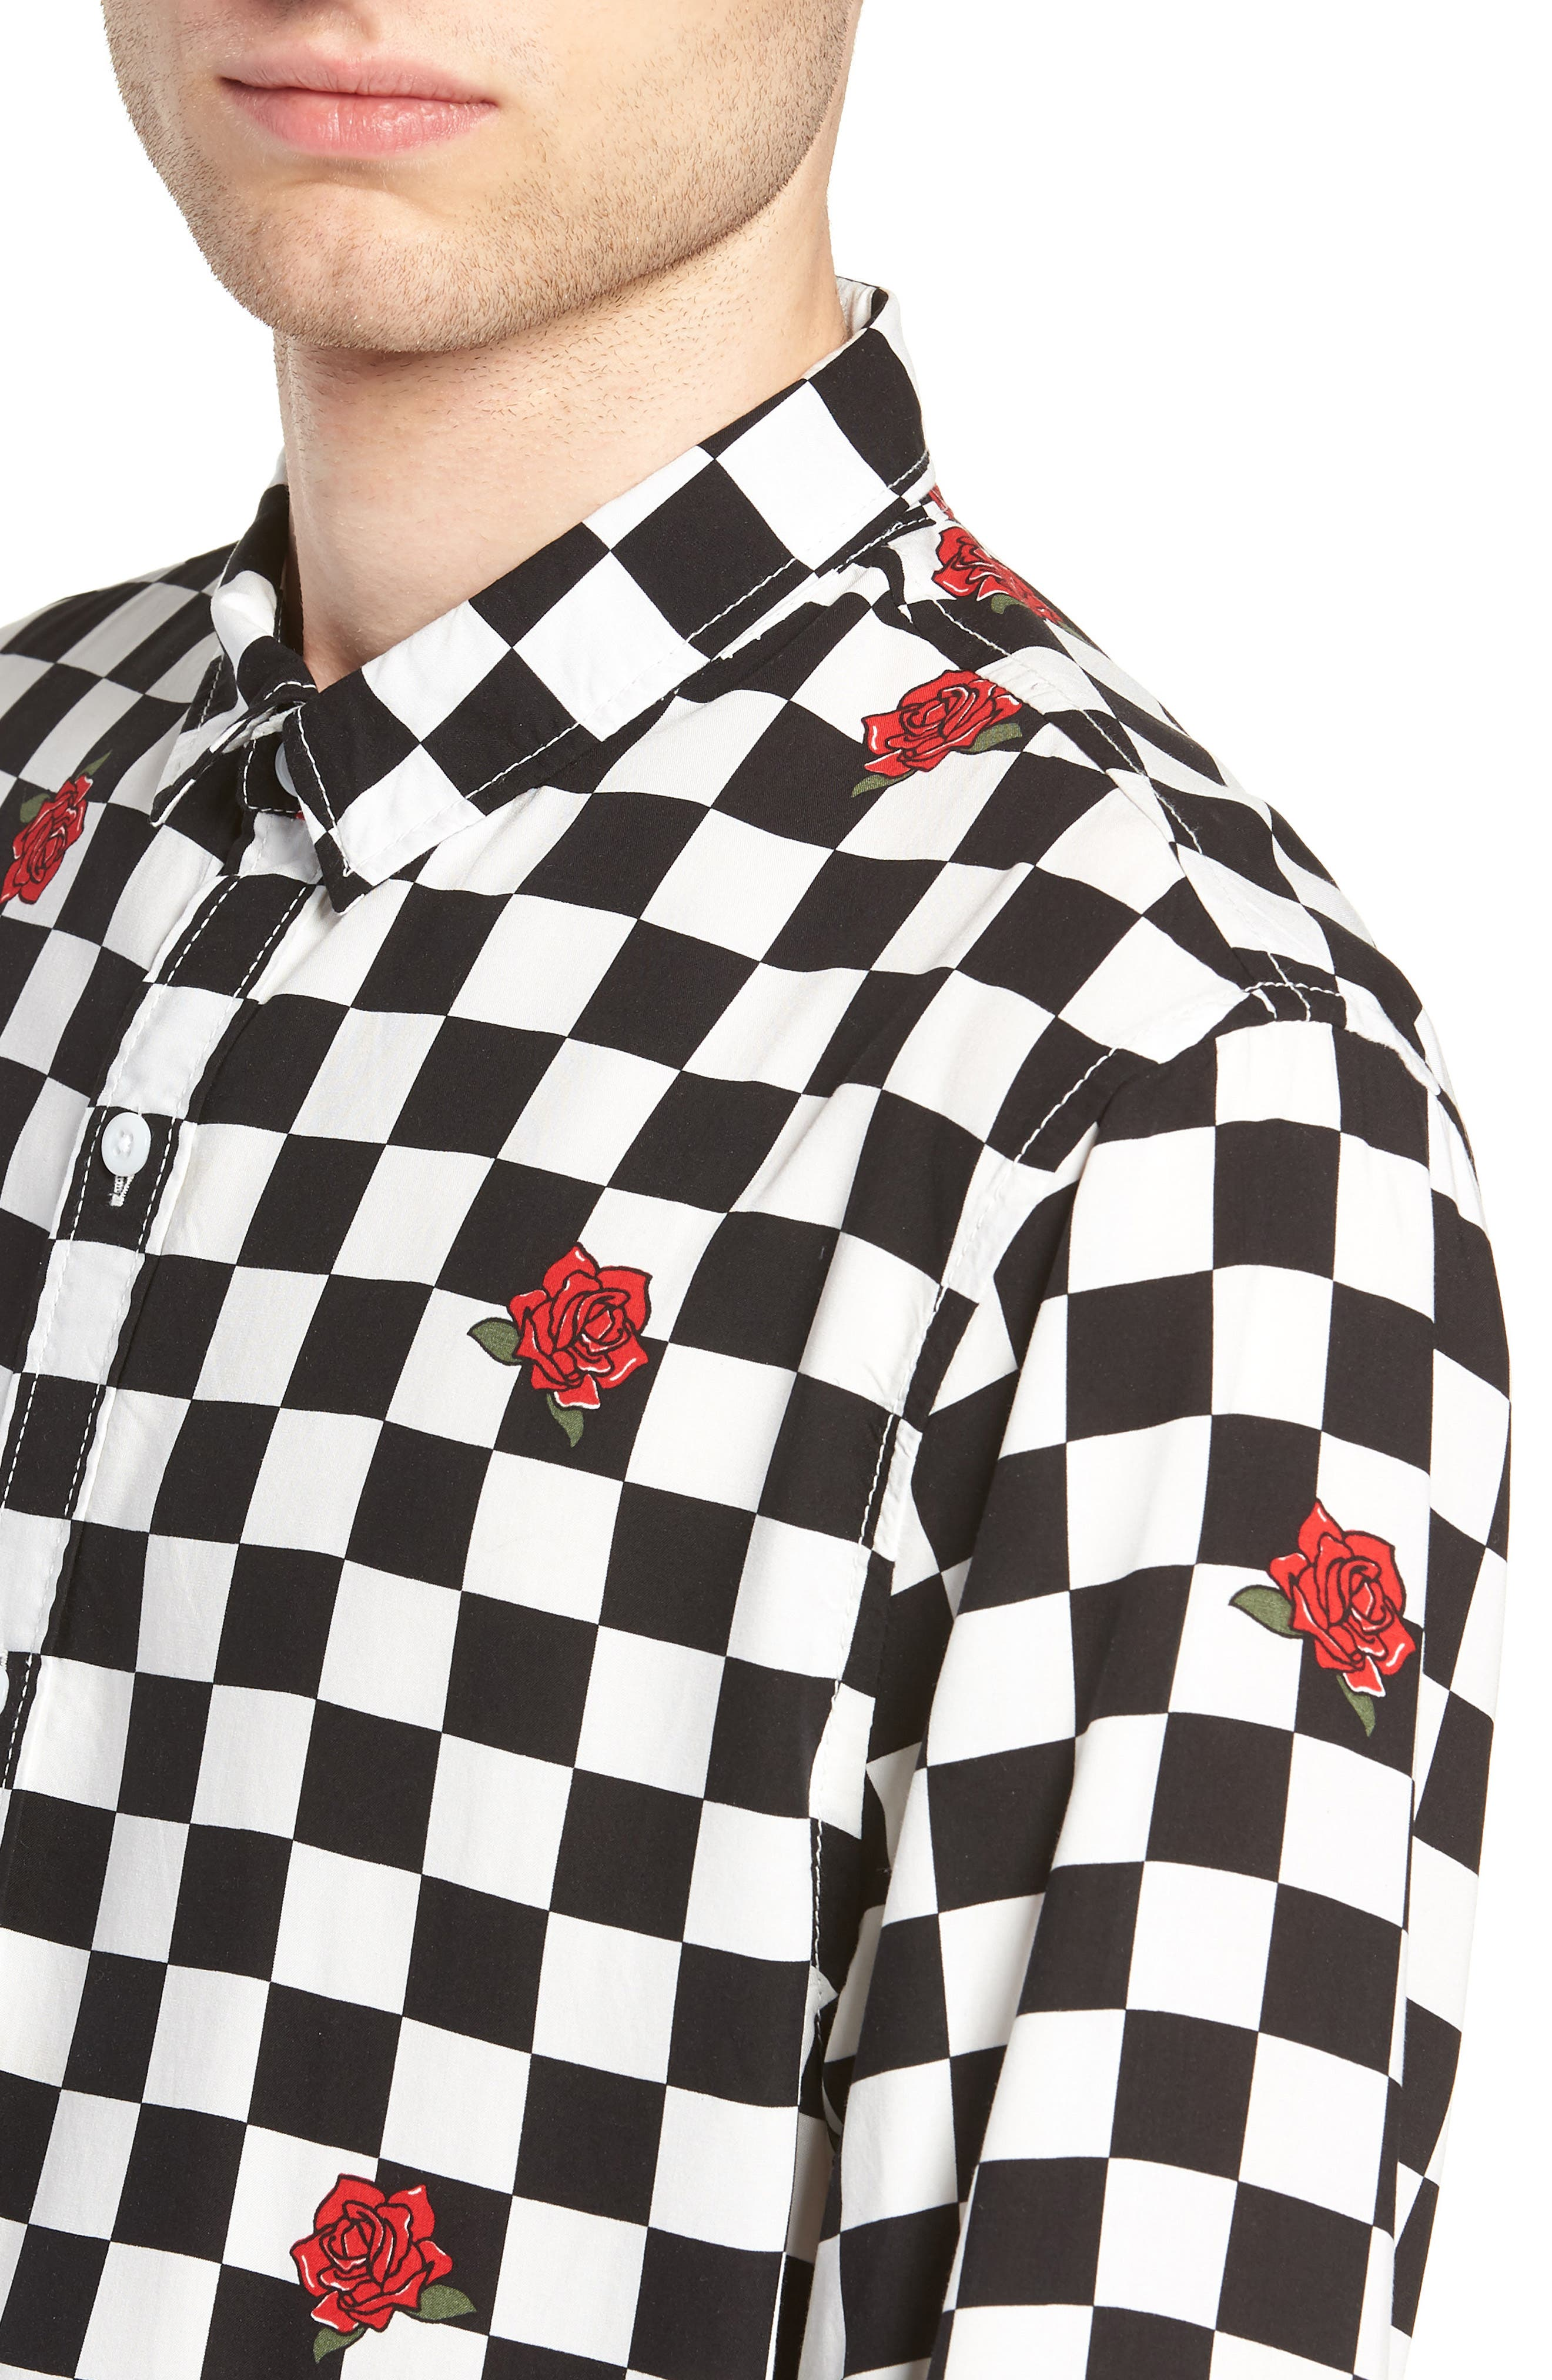 Checkerboard Rose Print Woven Shirt,                             Alternate thumbnail 4, color,                             001